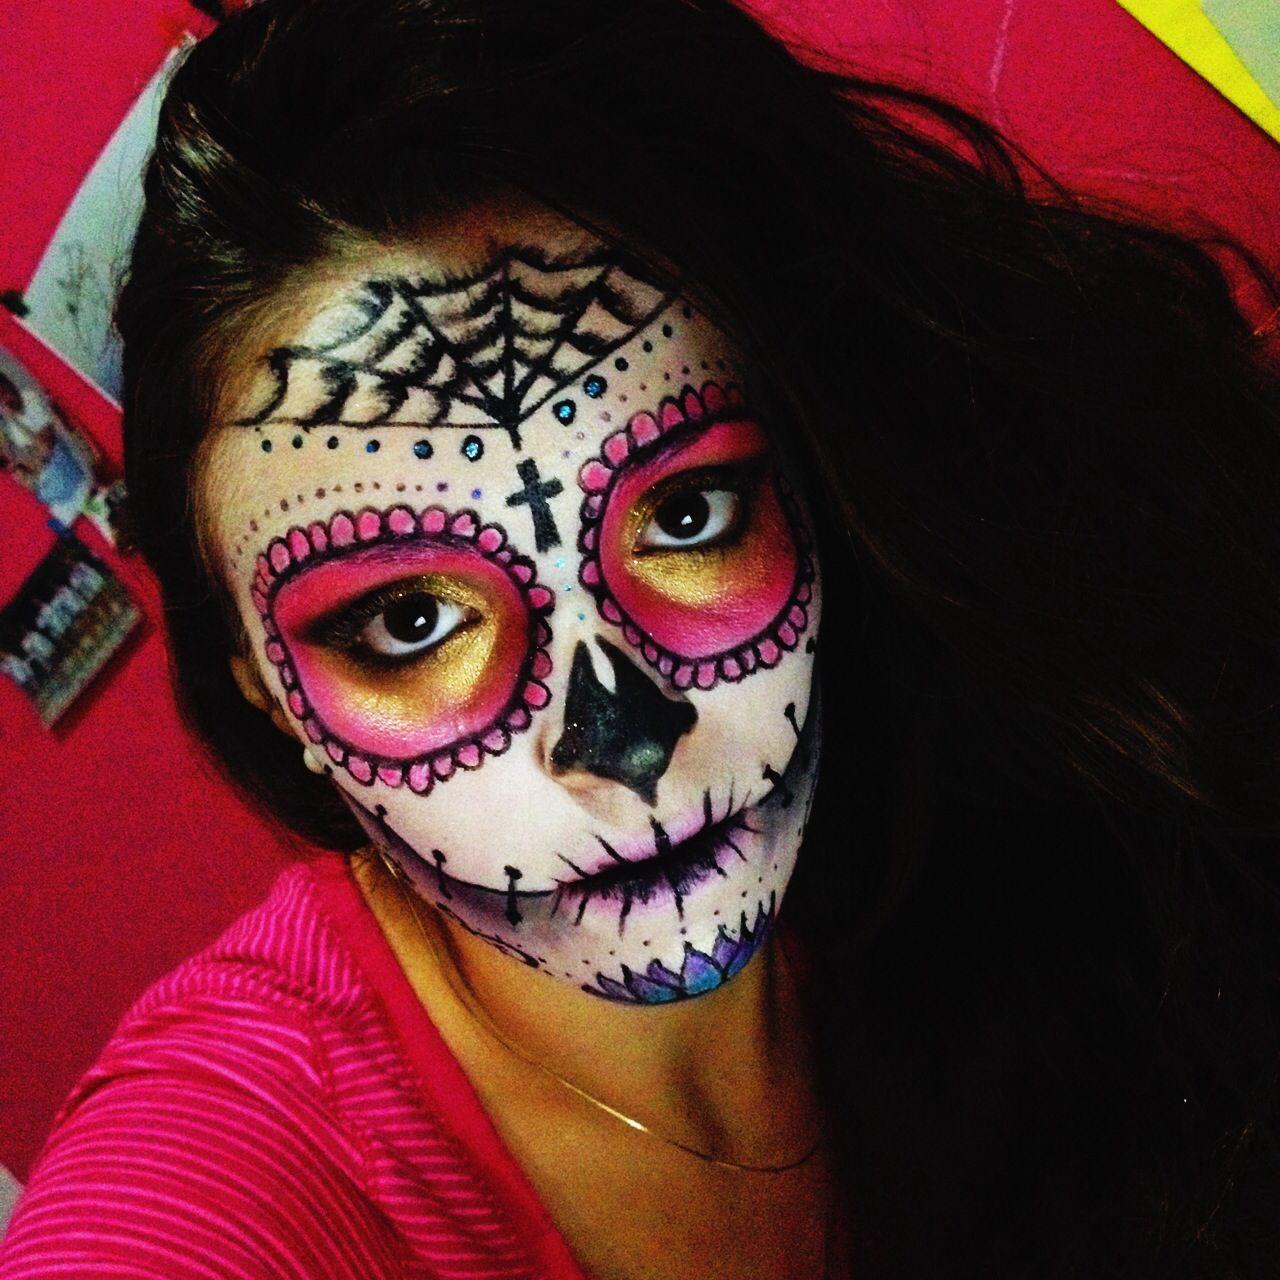 Sugar Skull Skull Sugarskull Mexico Culture Halloween Pink Gold Girl Costume Cute Girl Halloween Makeup Sugar Skull Makeup Halloween Makeup Looks